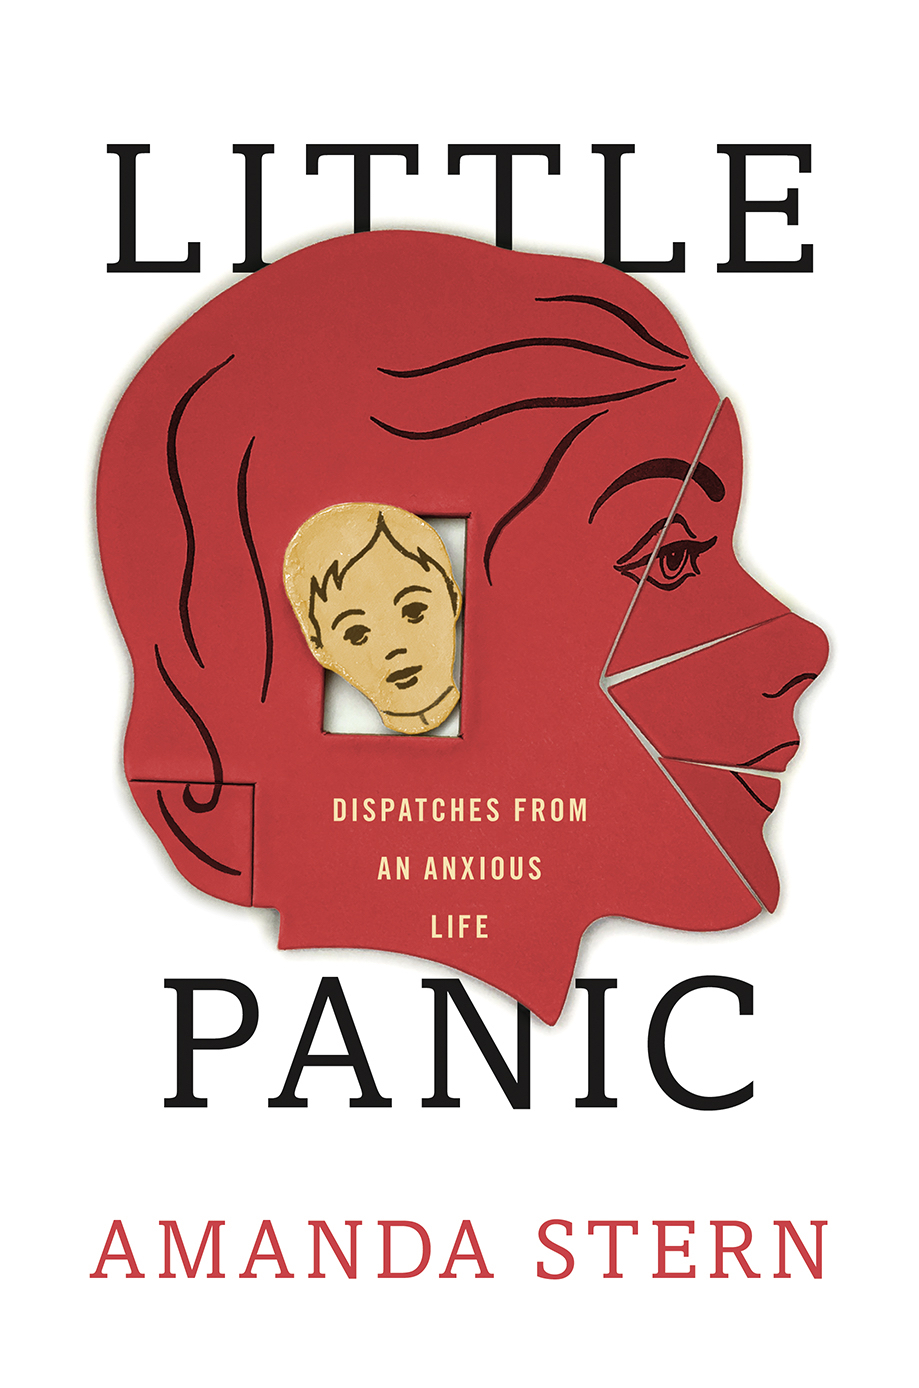 Amanda's memoir, Little Panic